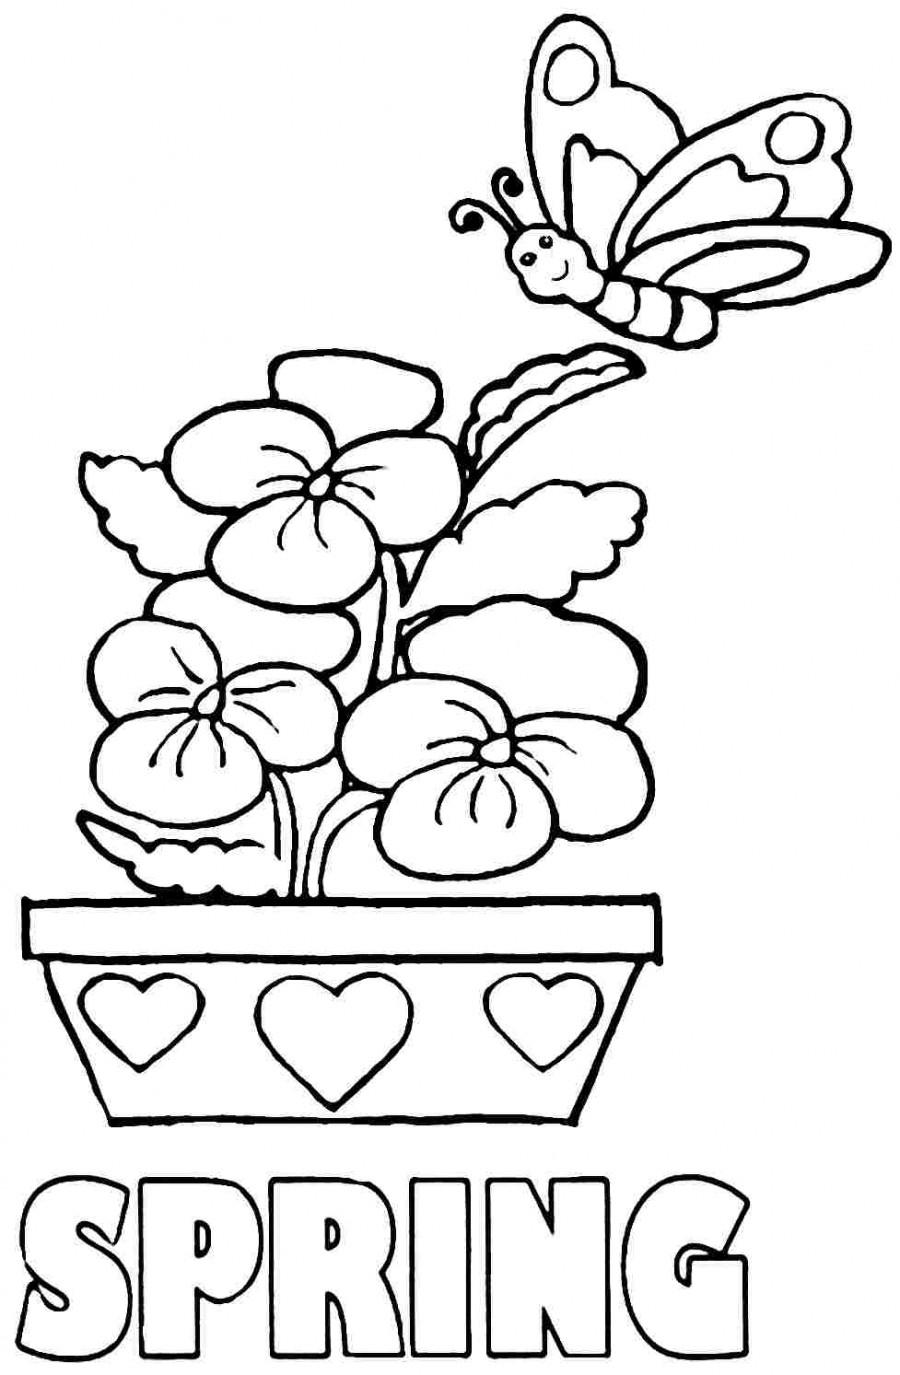 Spring Coloring Sheets Preschool Printable Spring Coloring Pictures - Free Printable Spring Pictures To Color